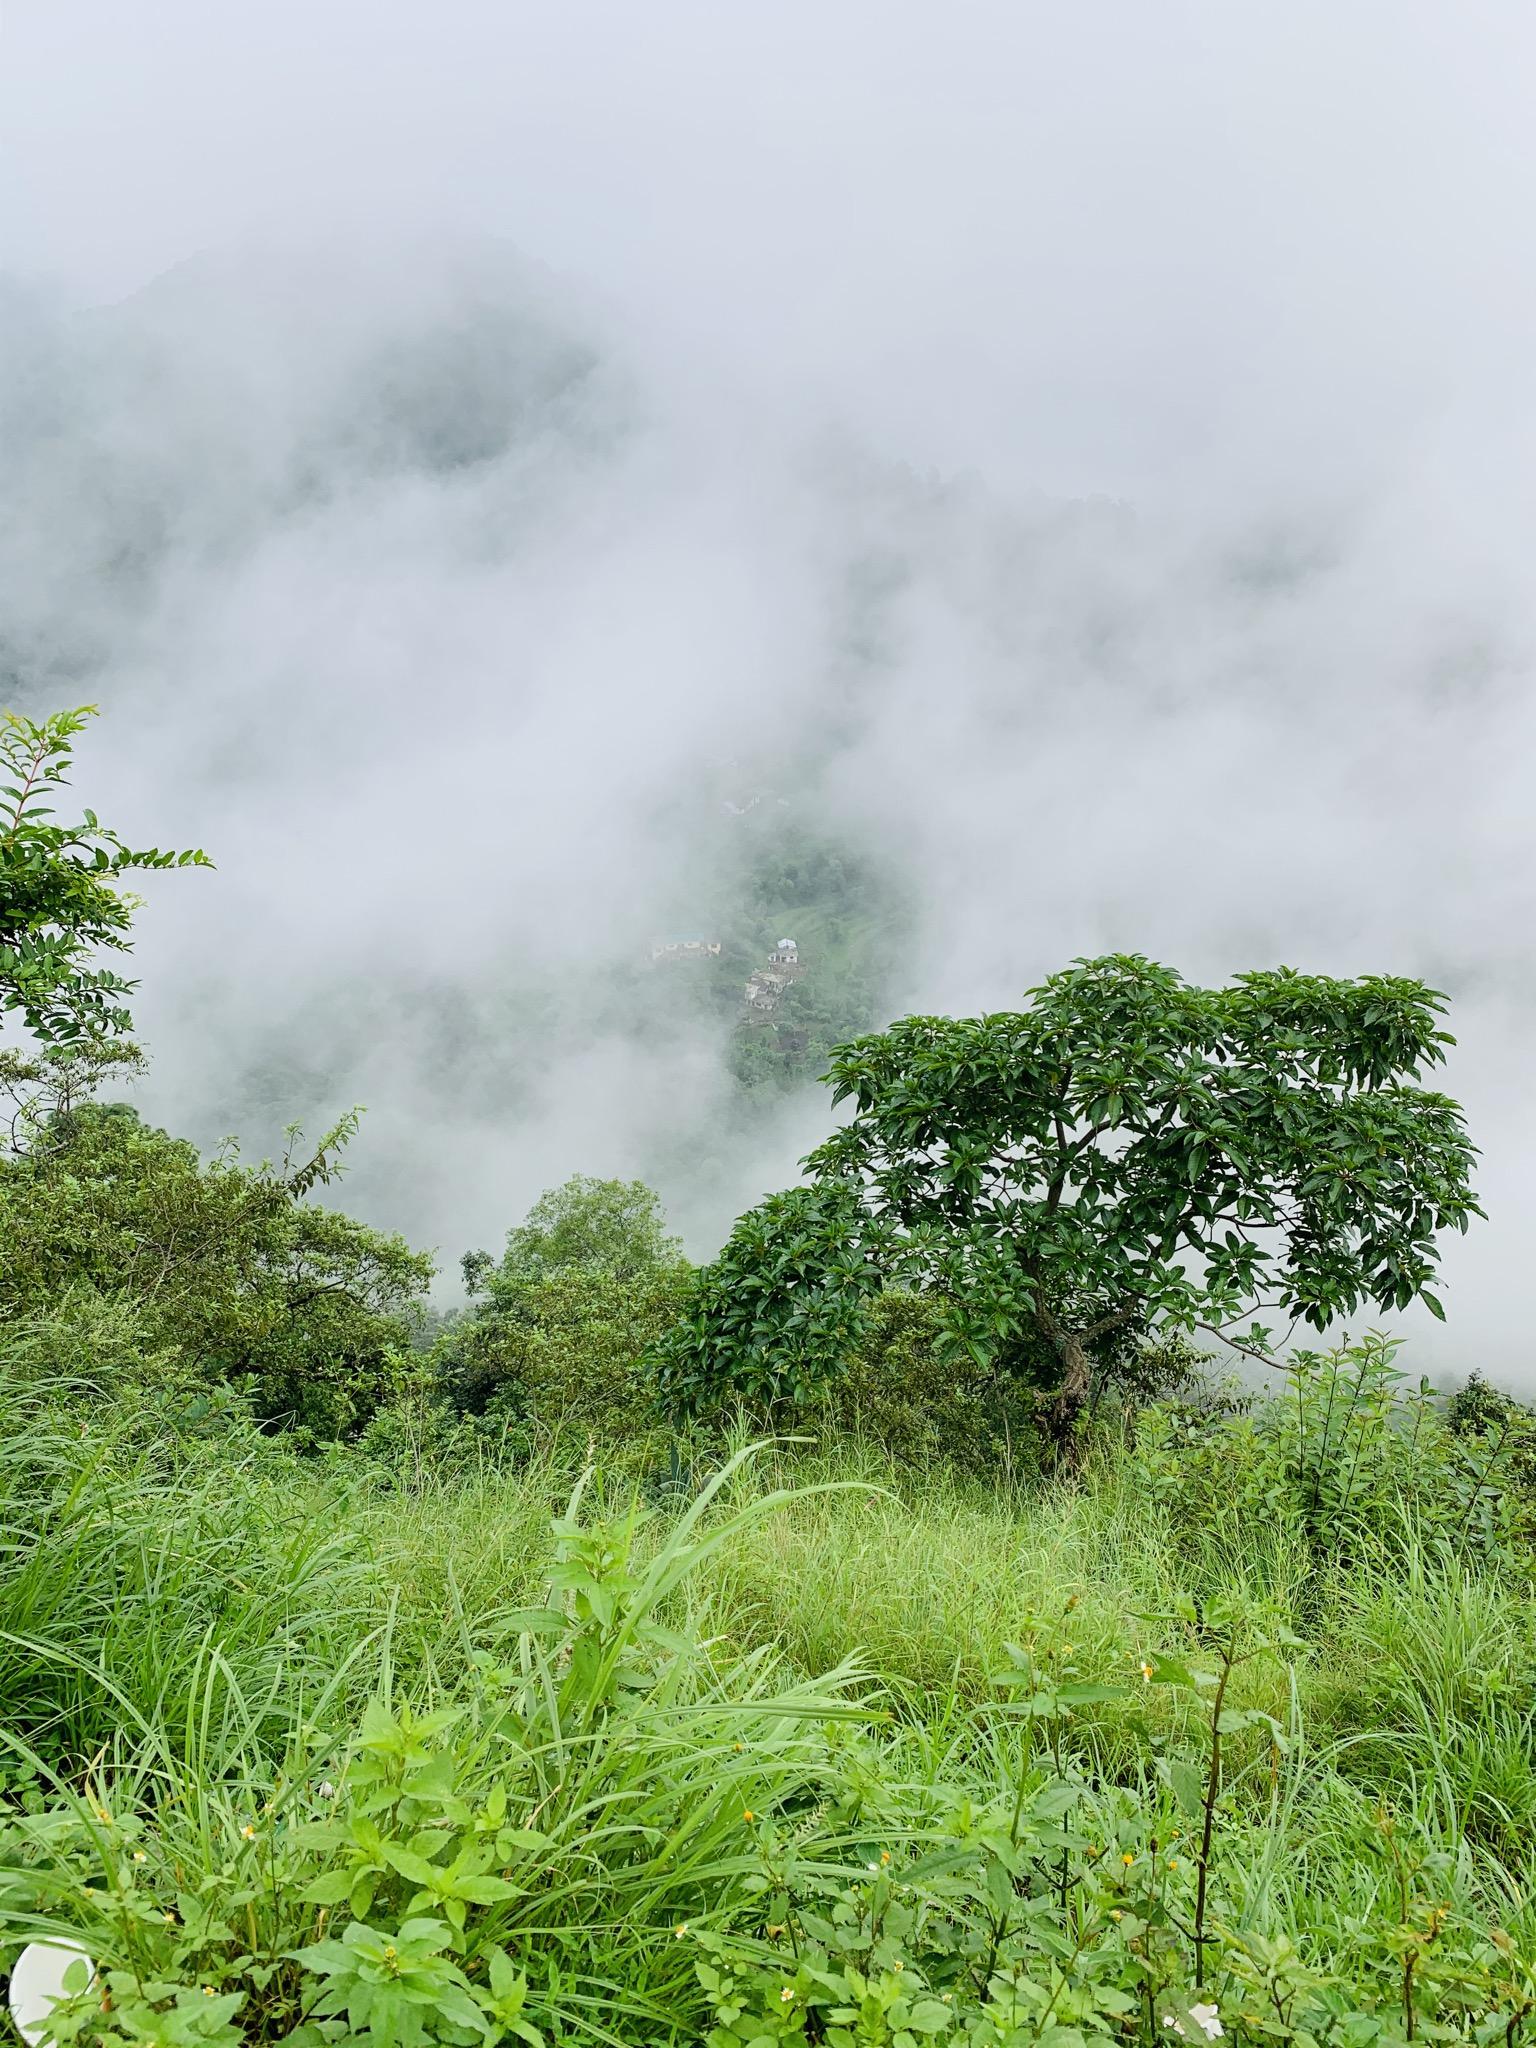 Foggy Mountain Scenery